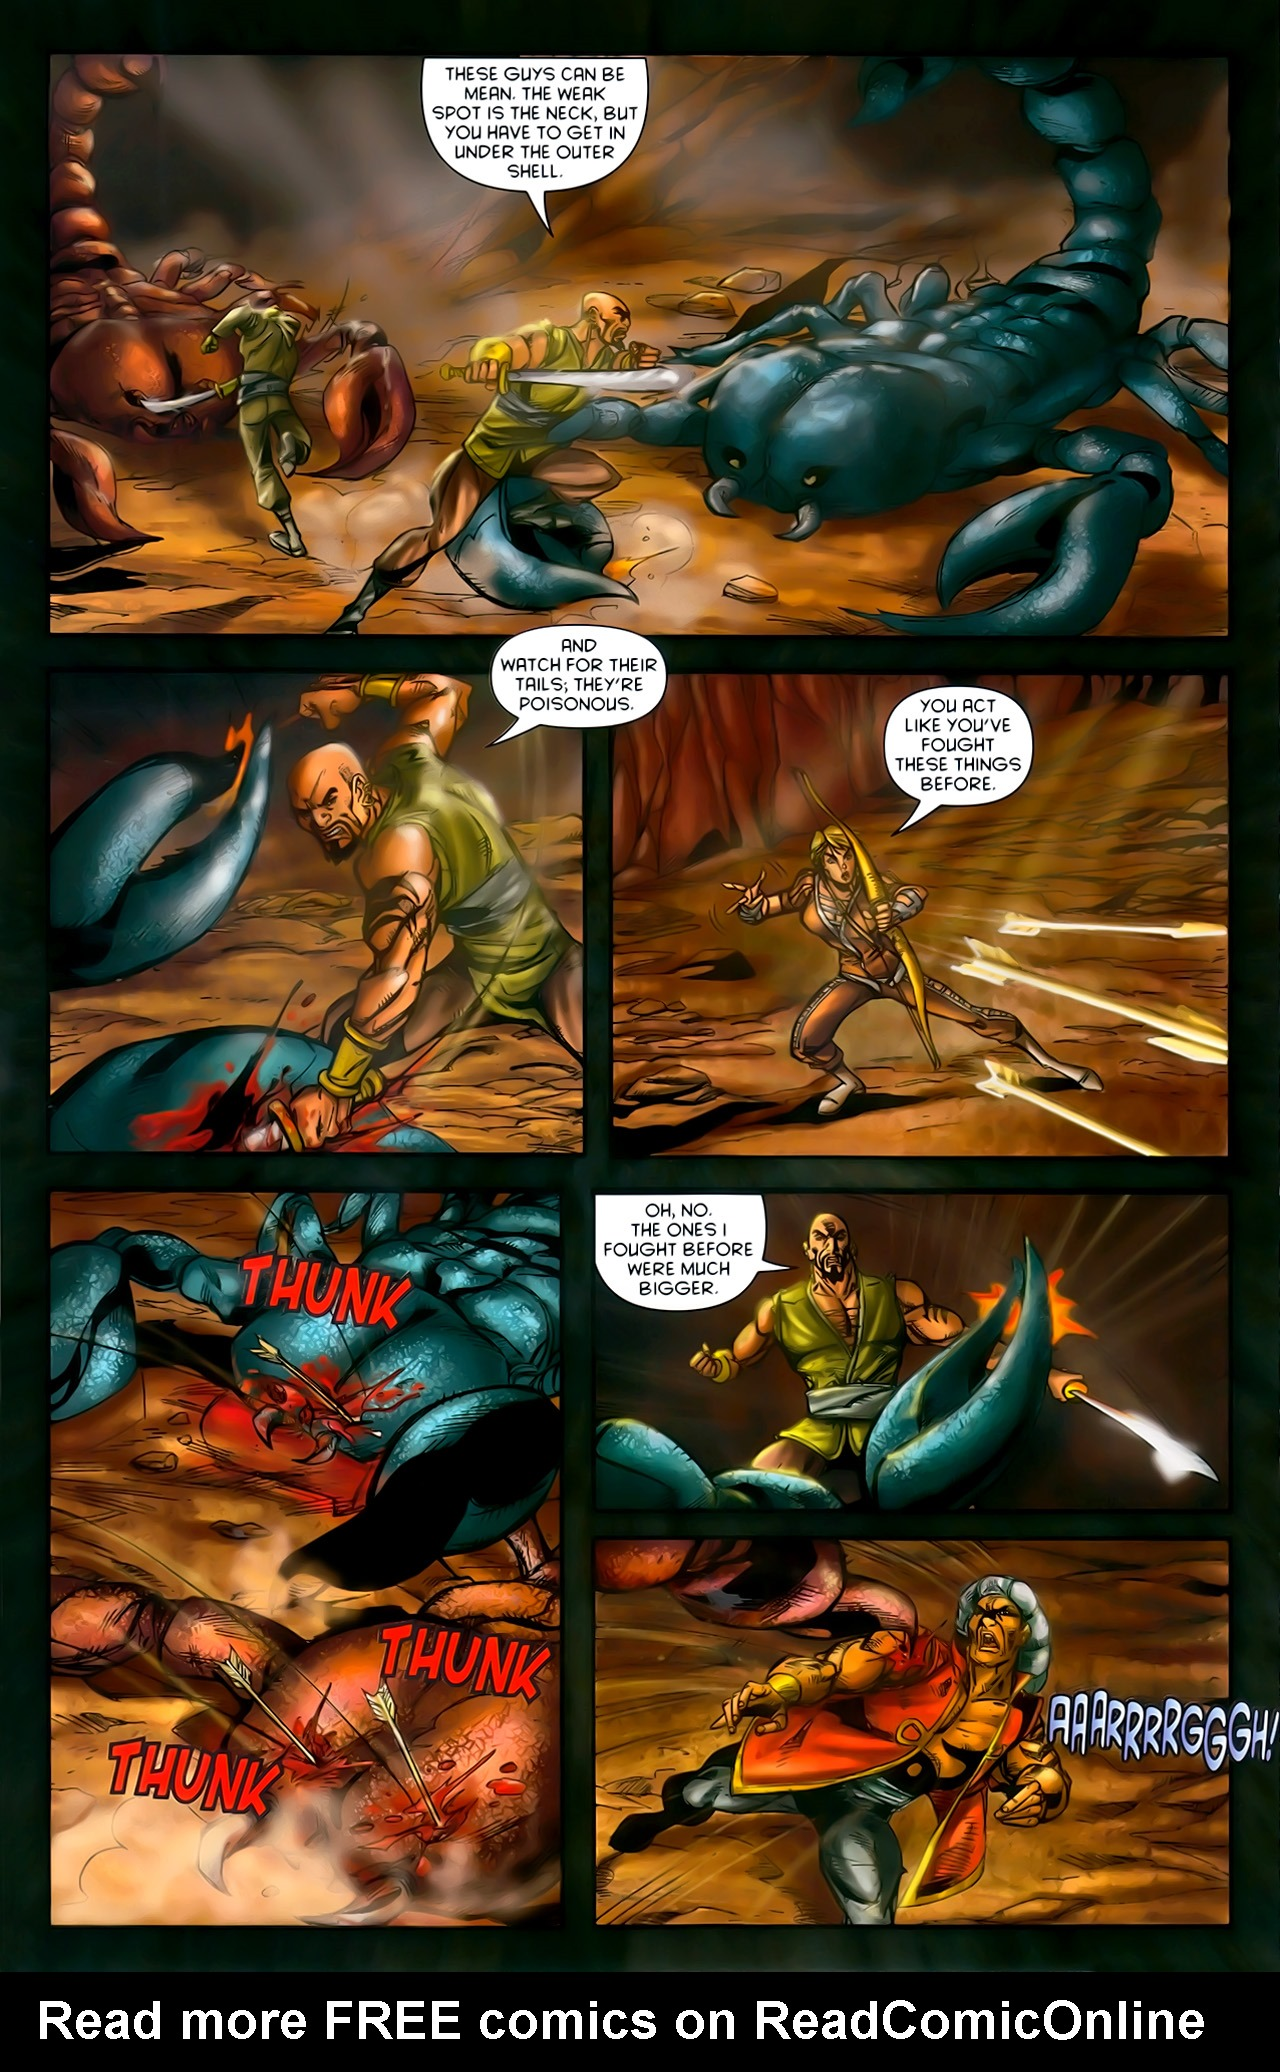 Read online 1001 Arabian Nights: The Adventures of Sinbad comic -  Issue #10 - 18